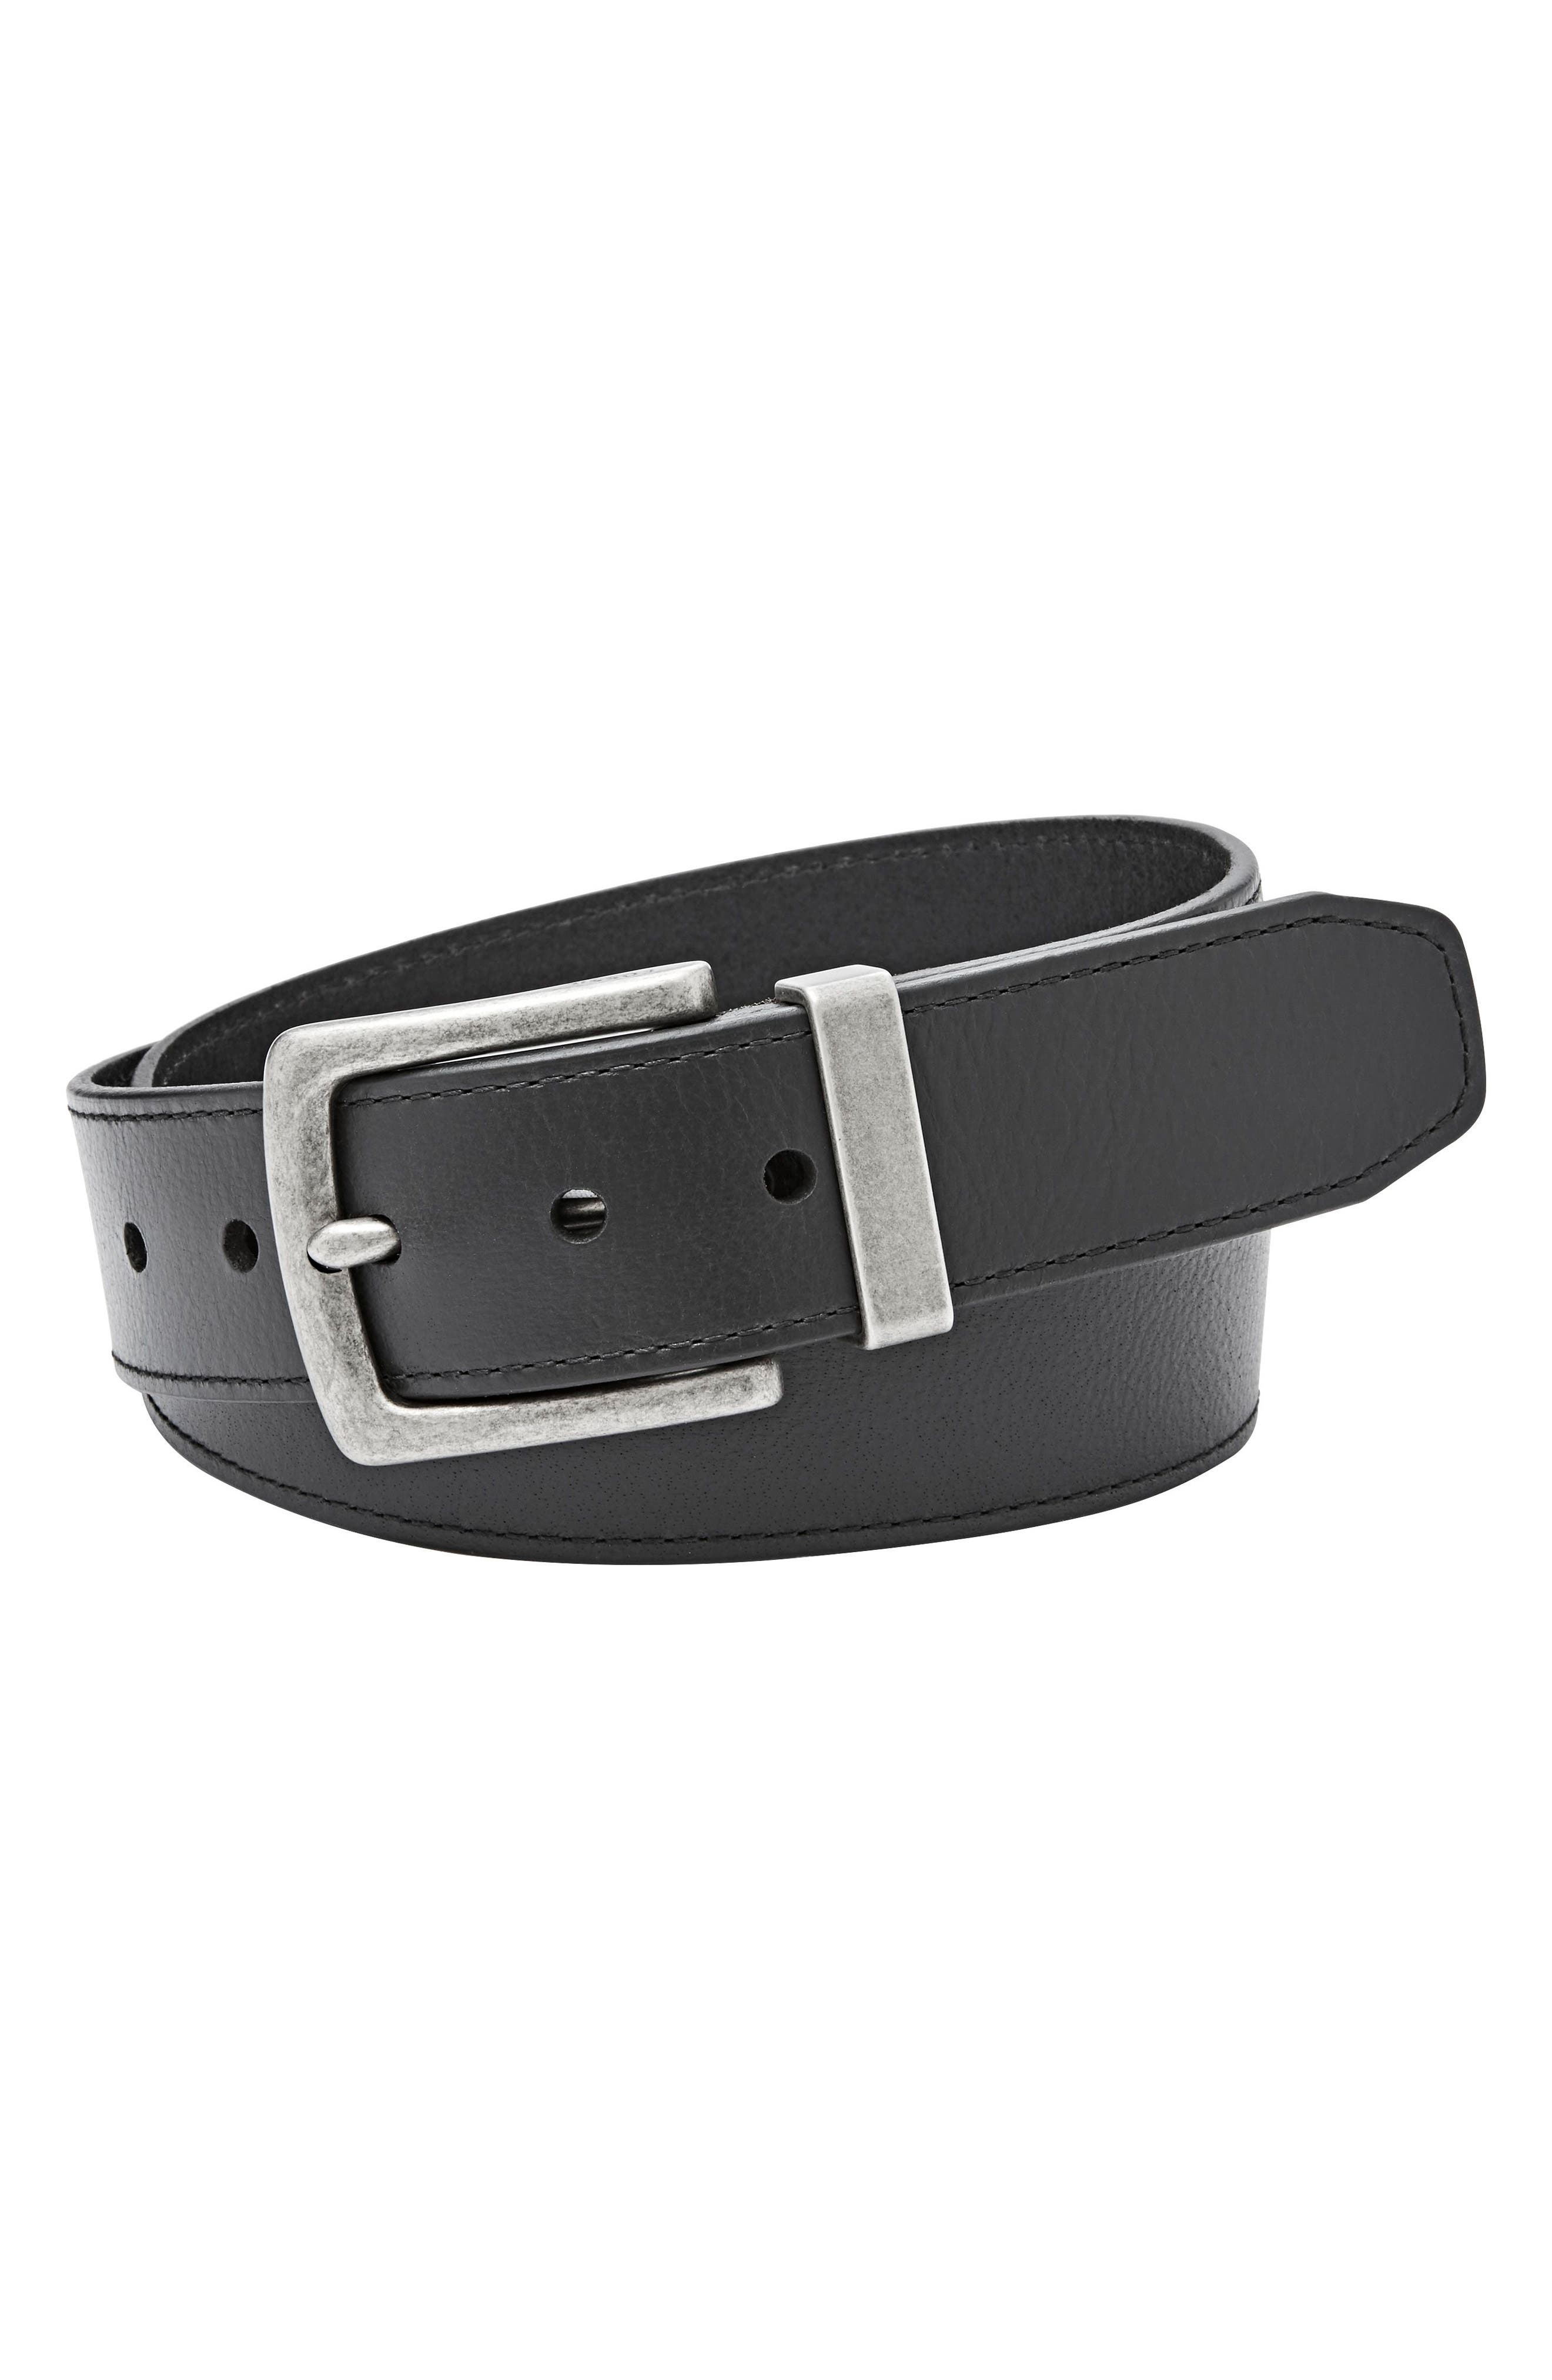 Fossil Mace Leather Belt